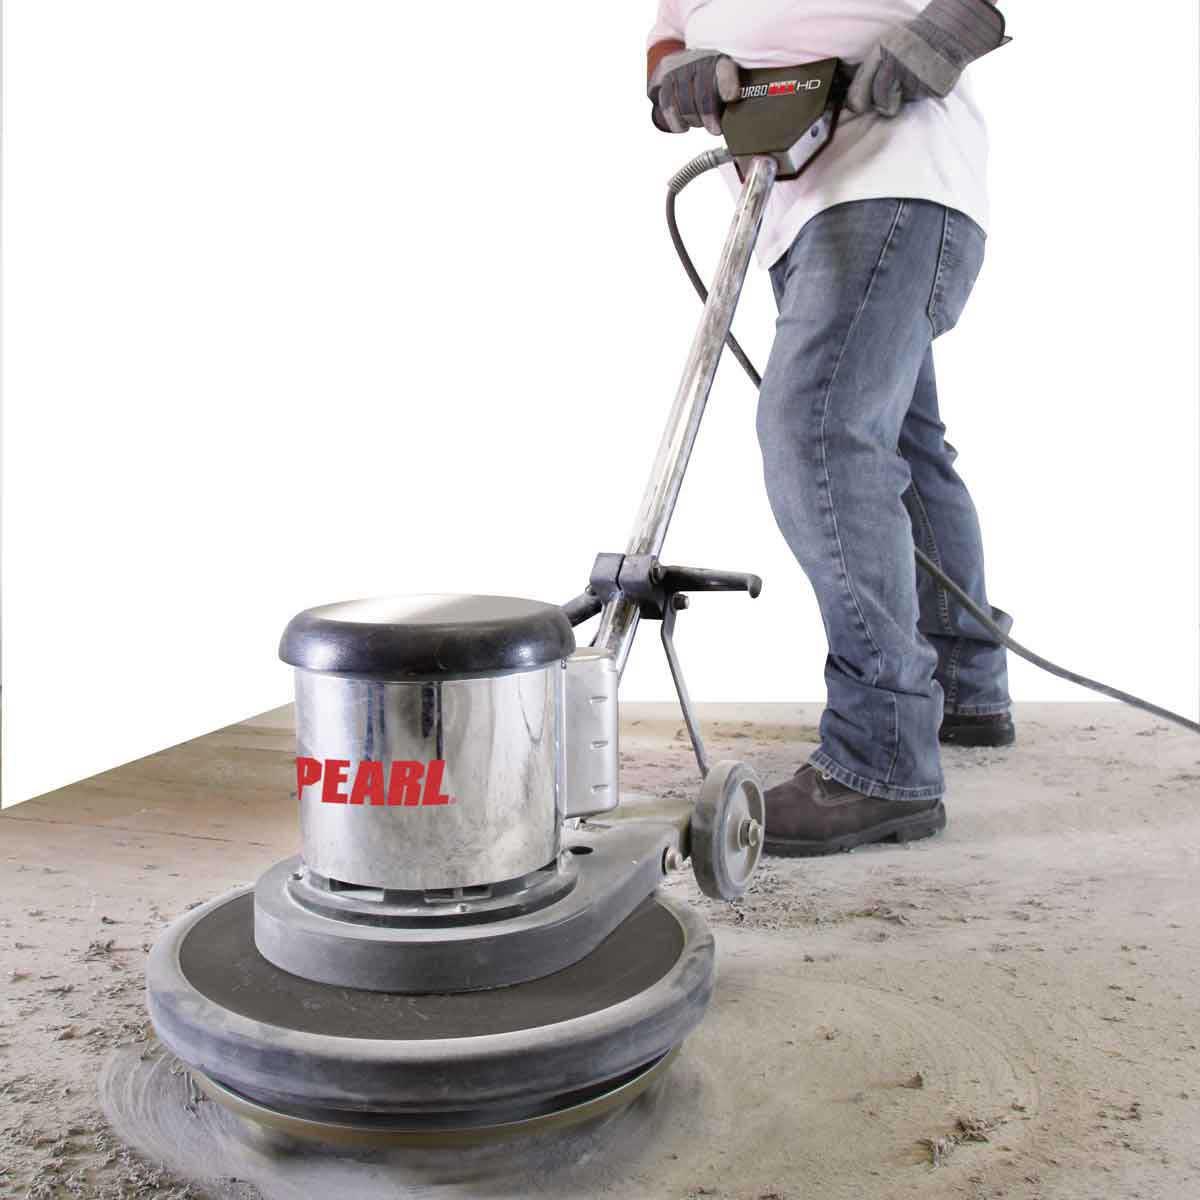 pearl turbomax concrete grinder